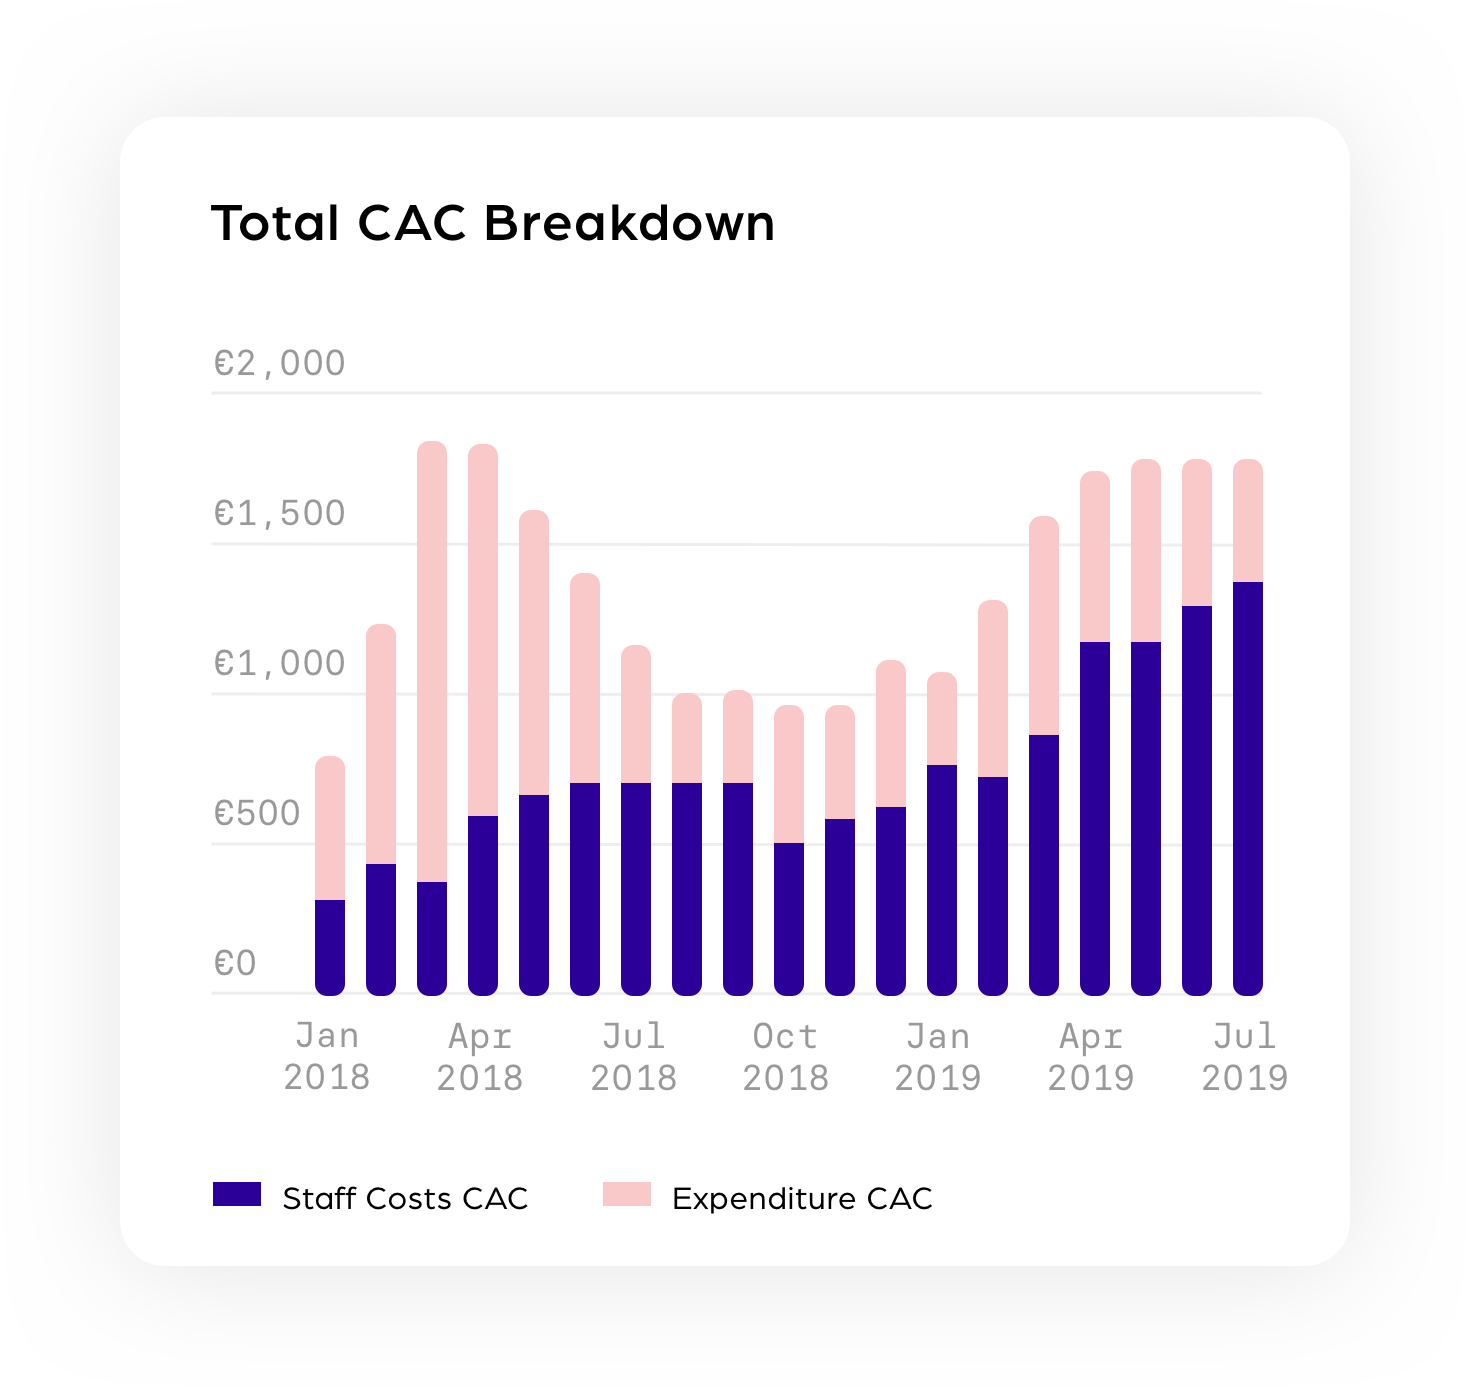 Total CAC Breakdown@3x